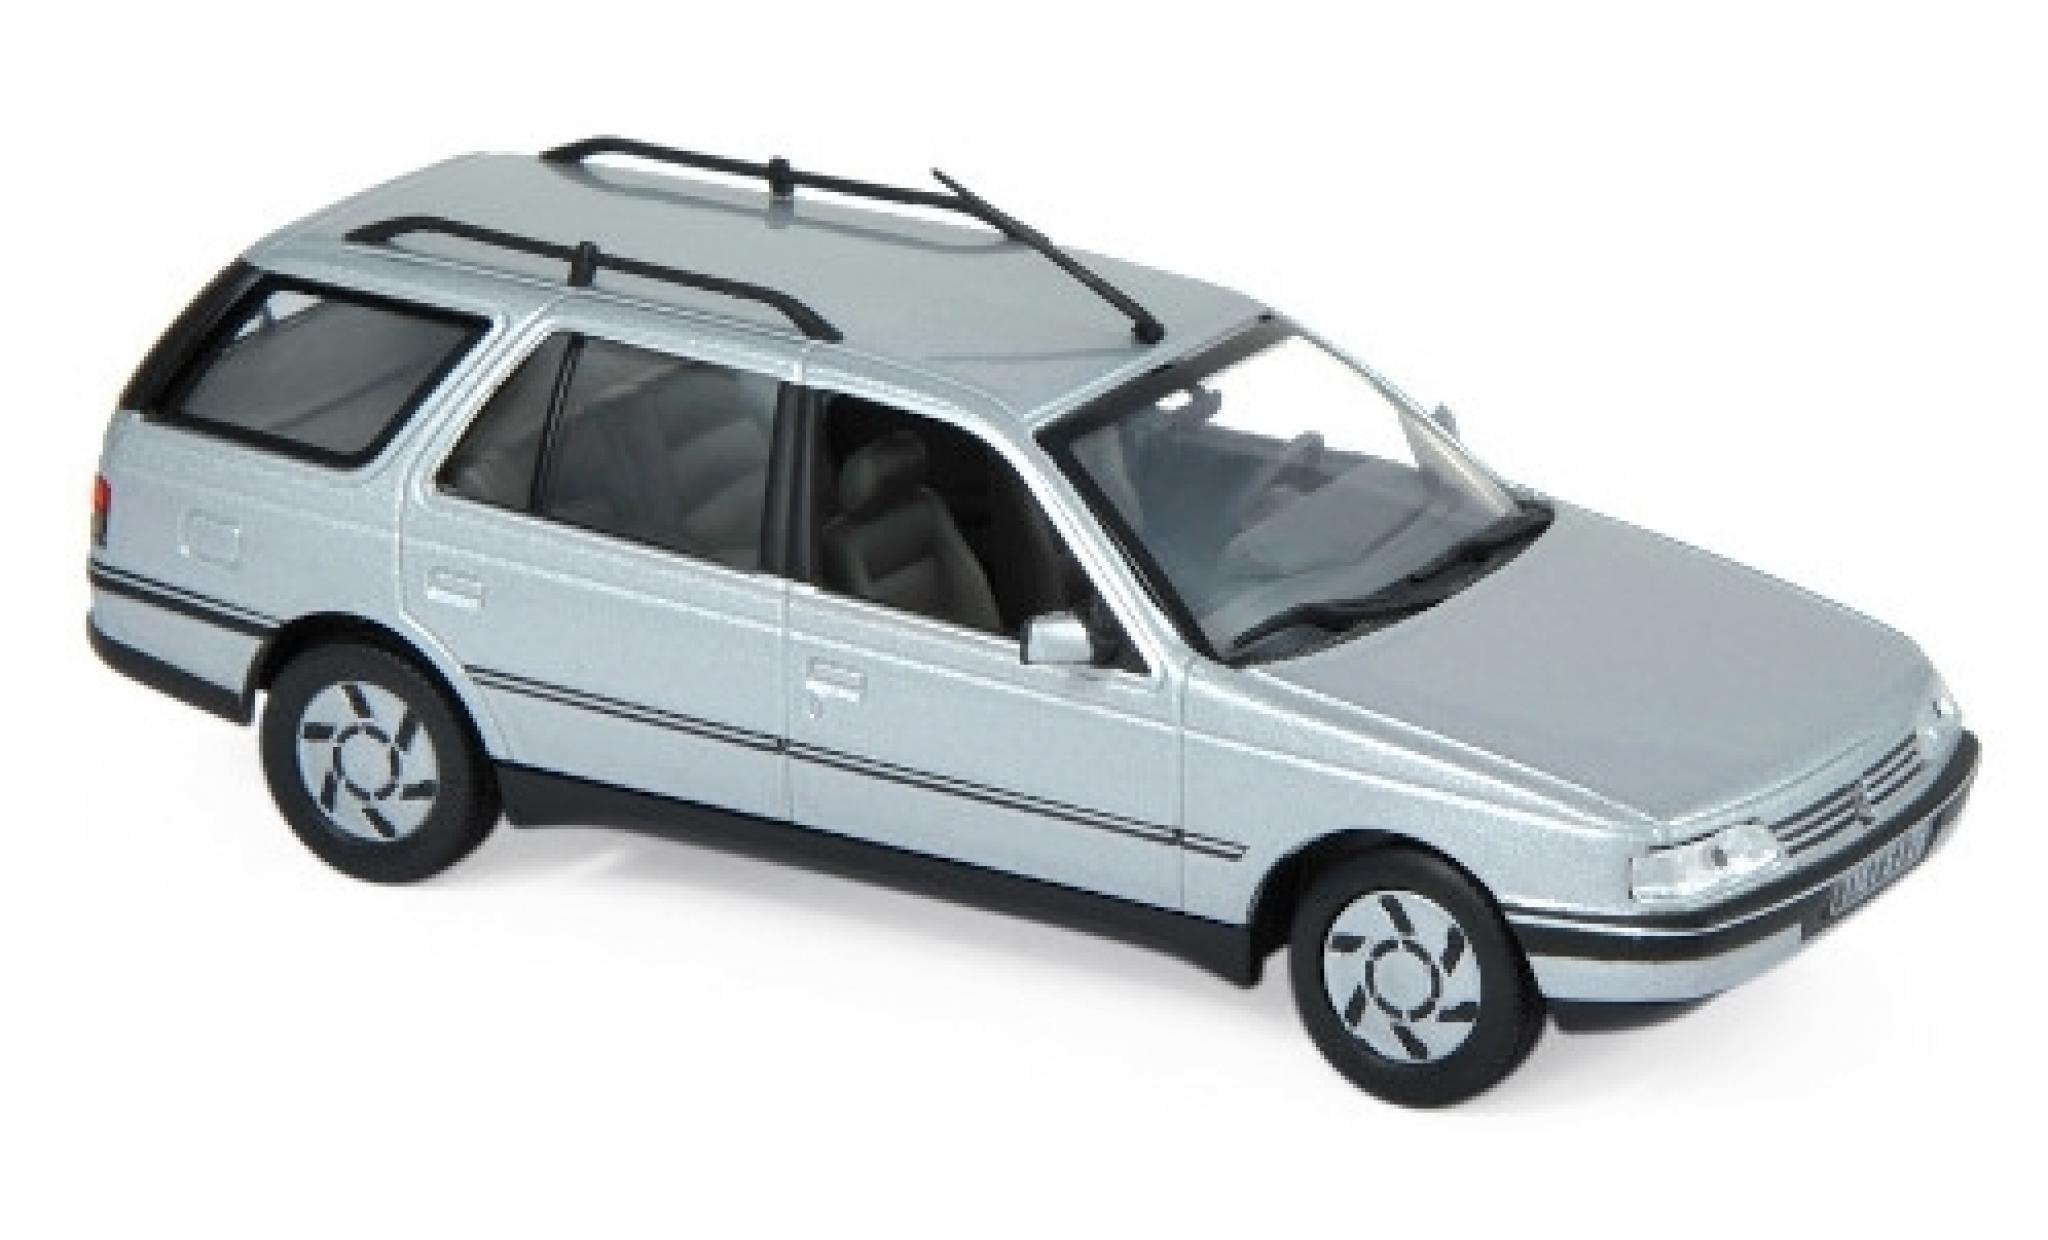 Peugeot 405 1/43 Norev Break metallise grise 1991